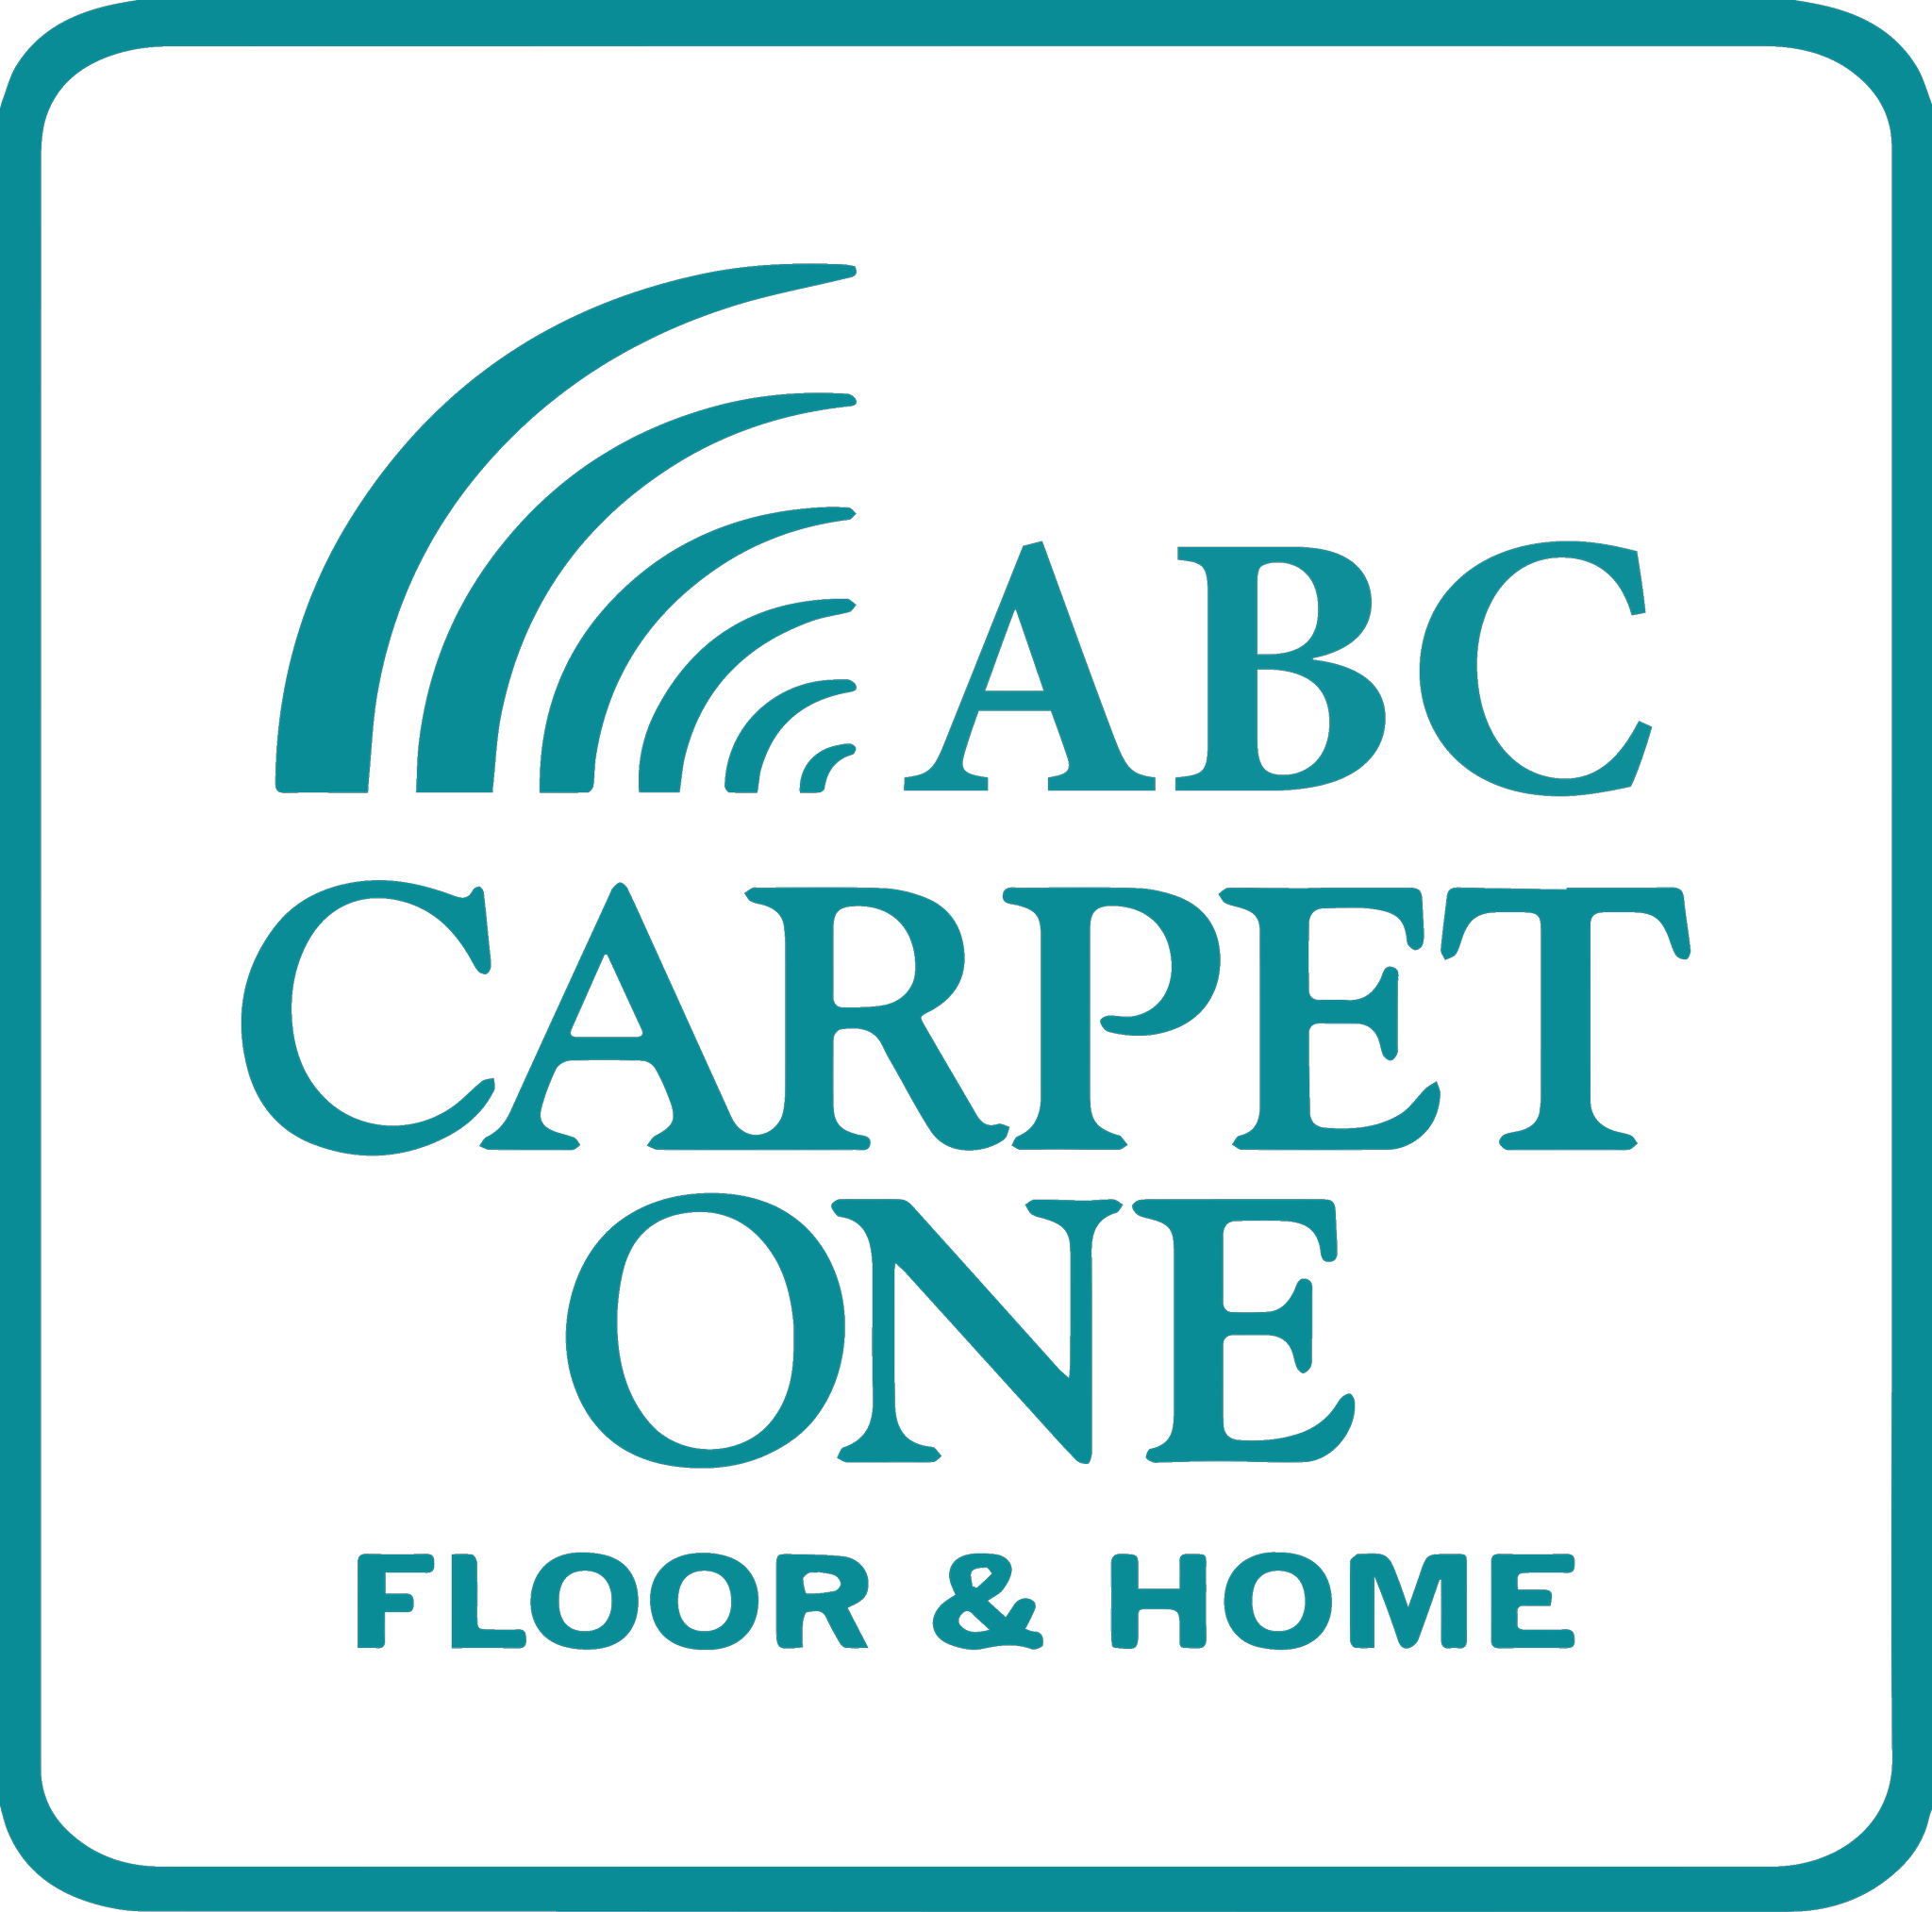 ABC Carpet One